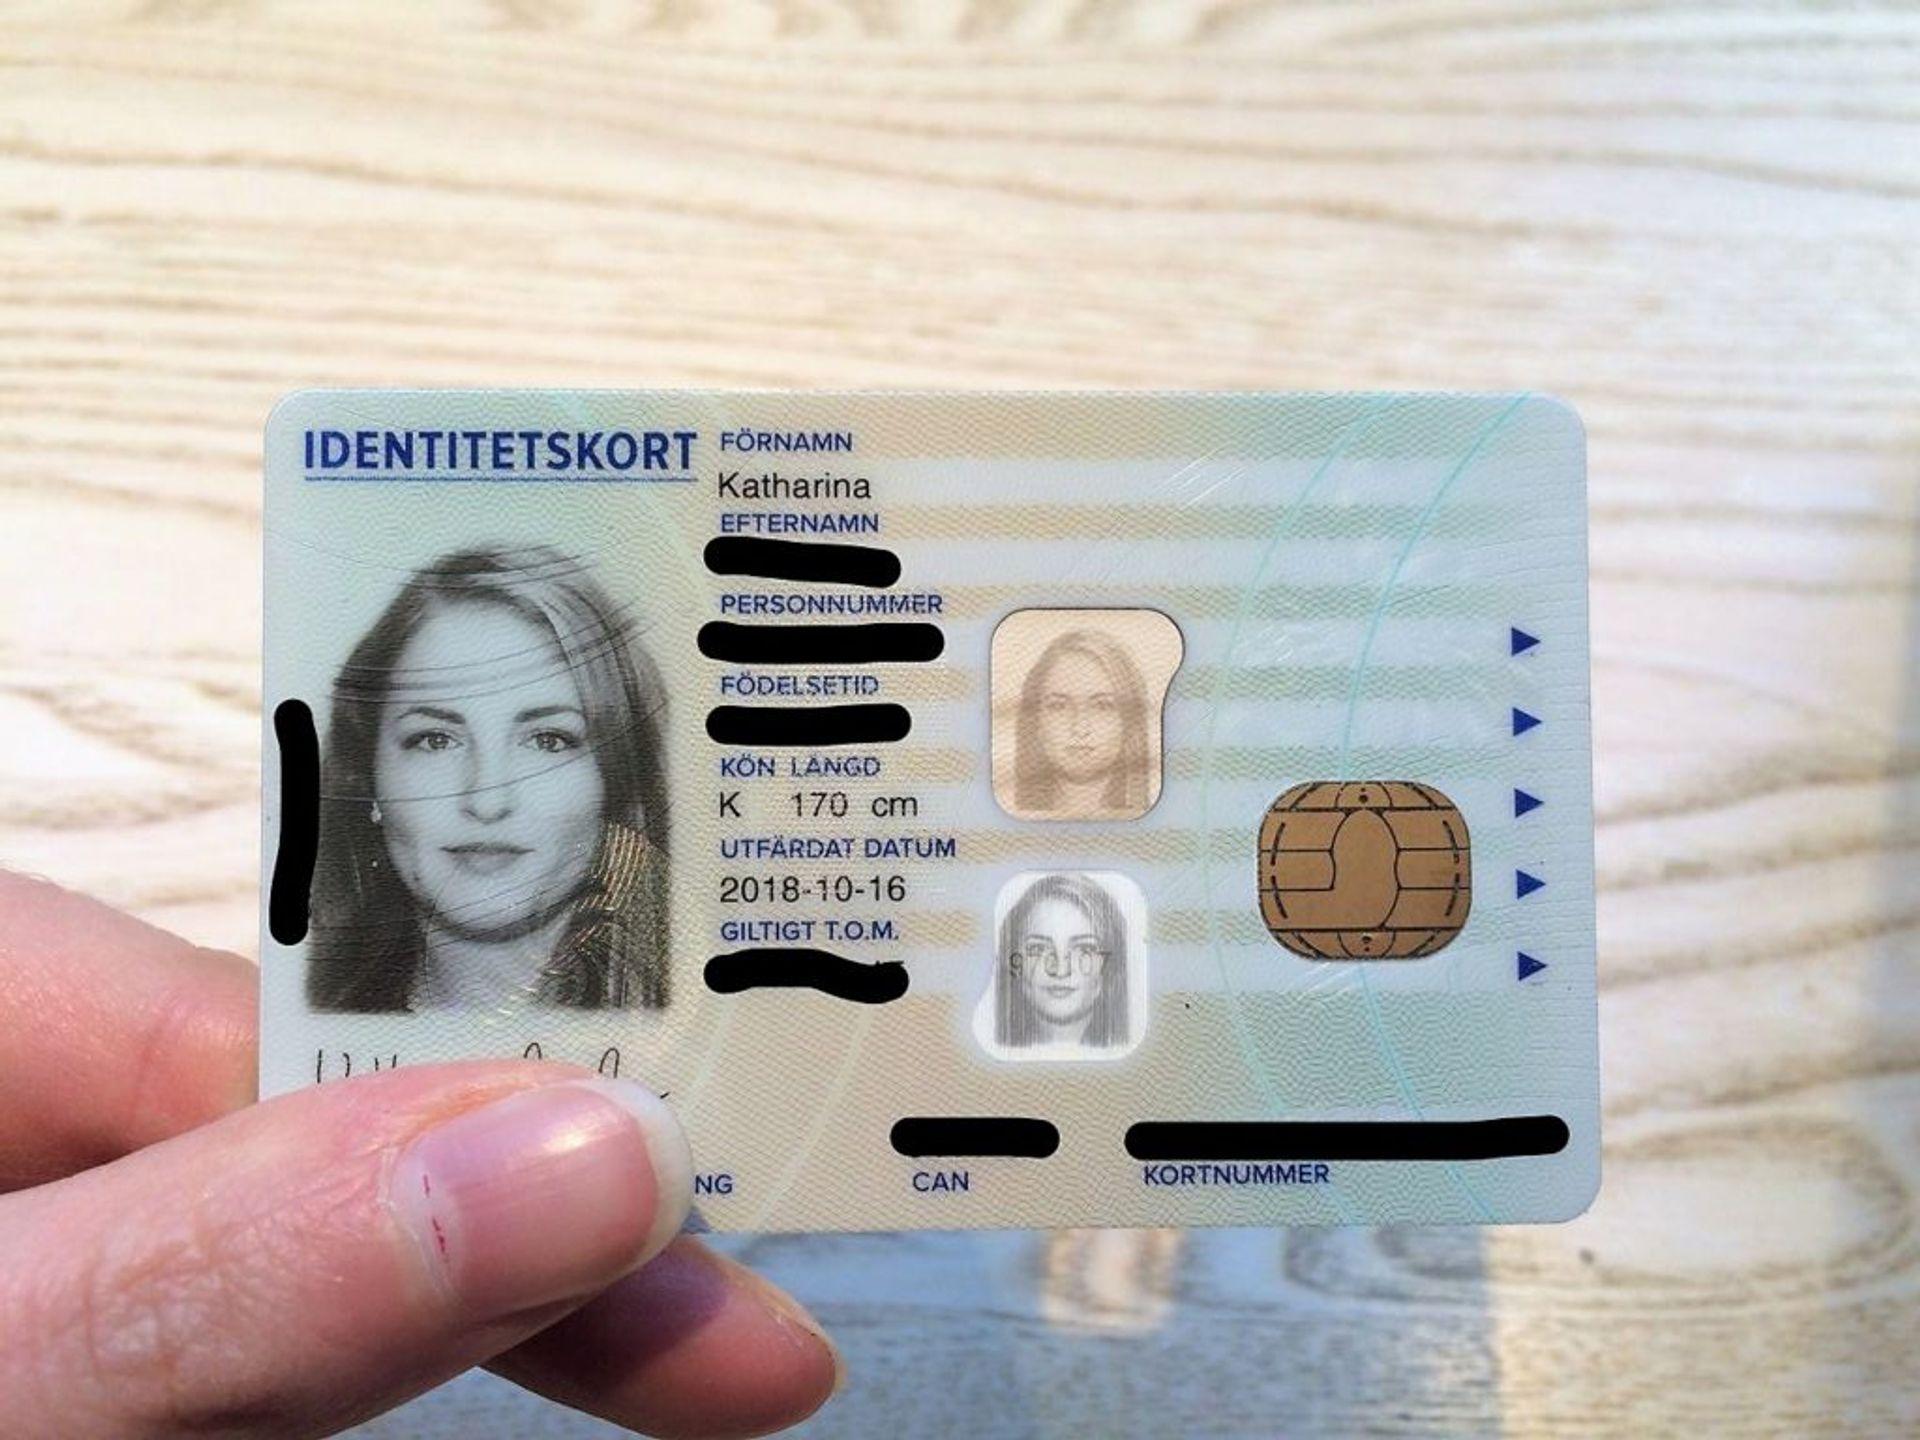 A Swedish ID card.